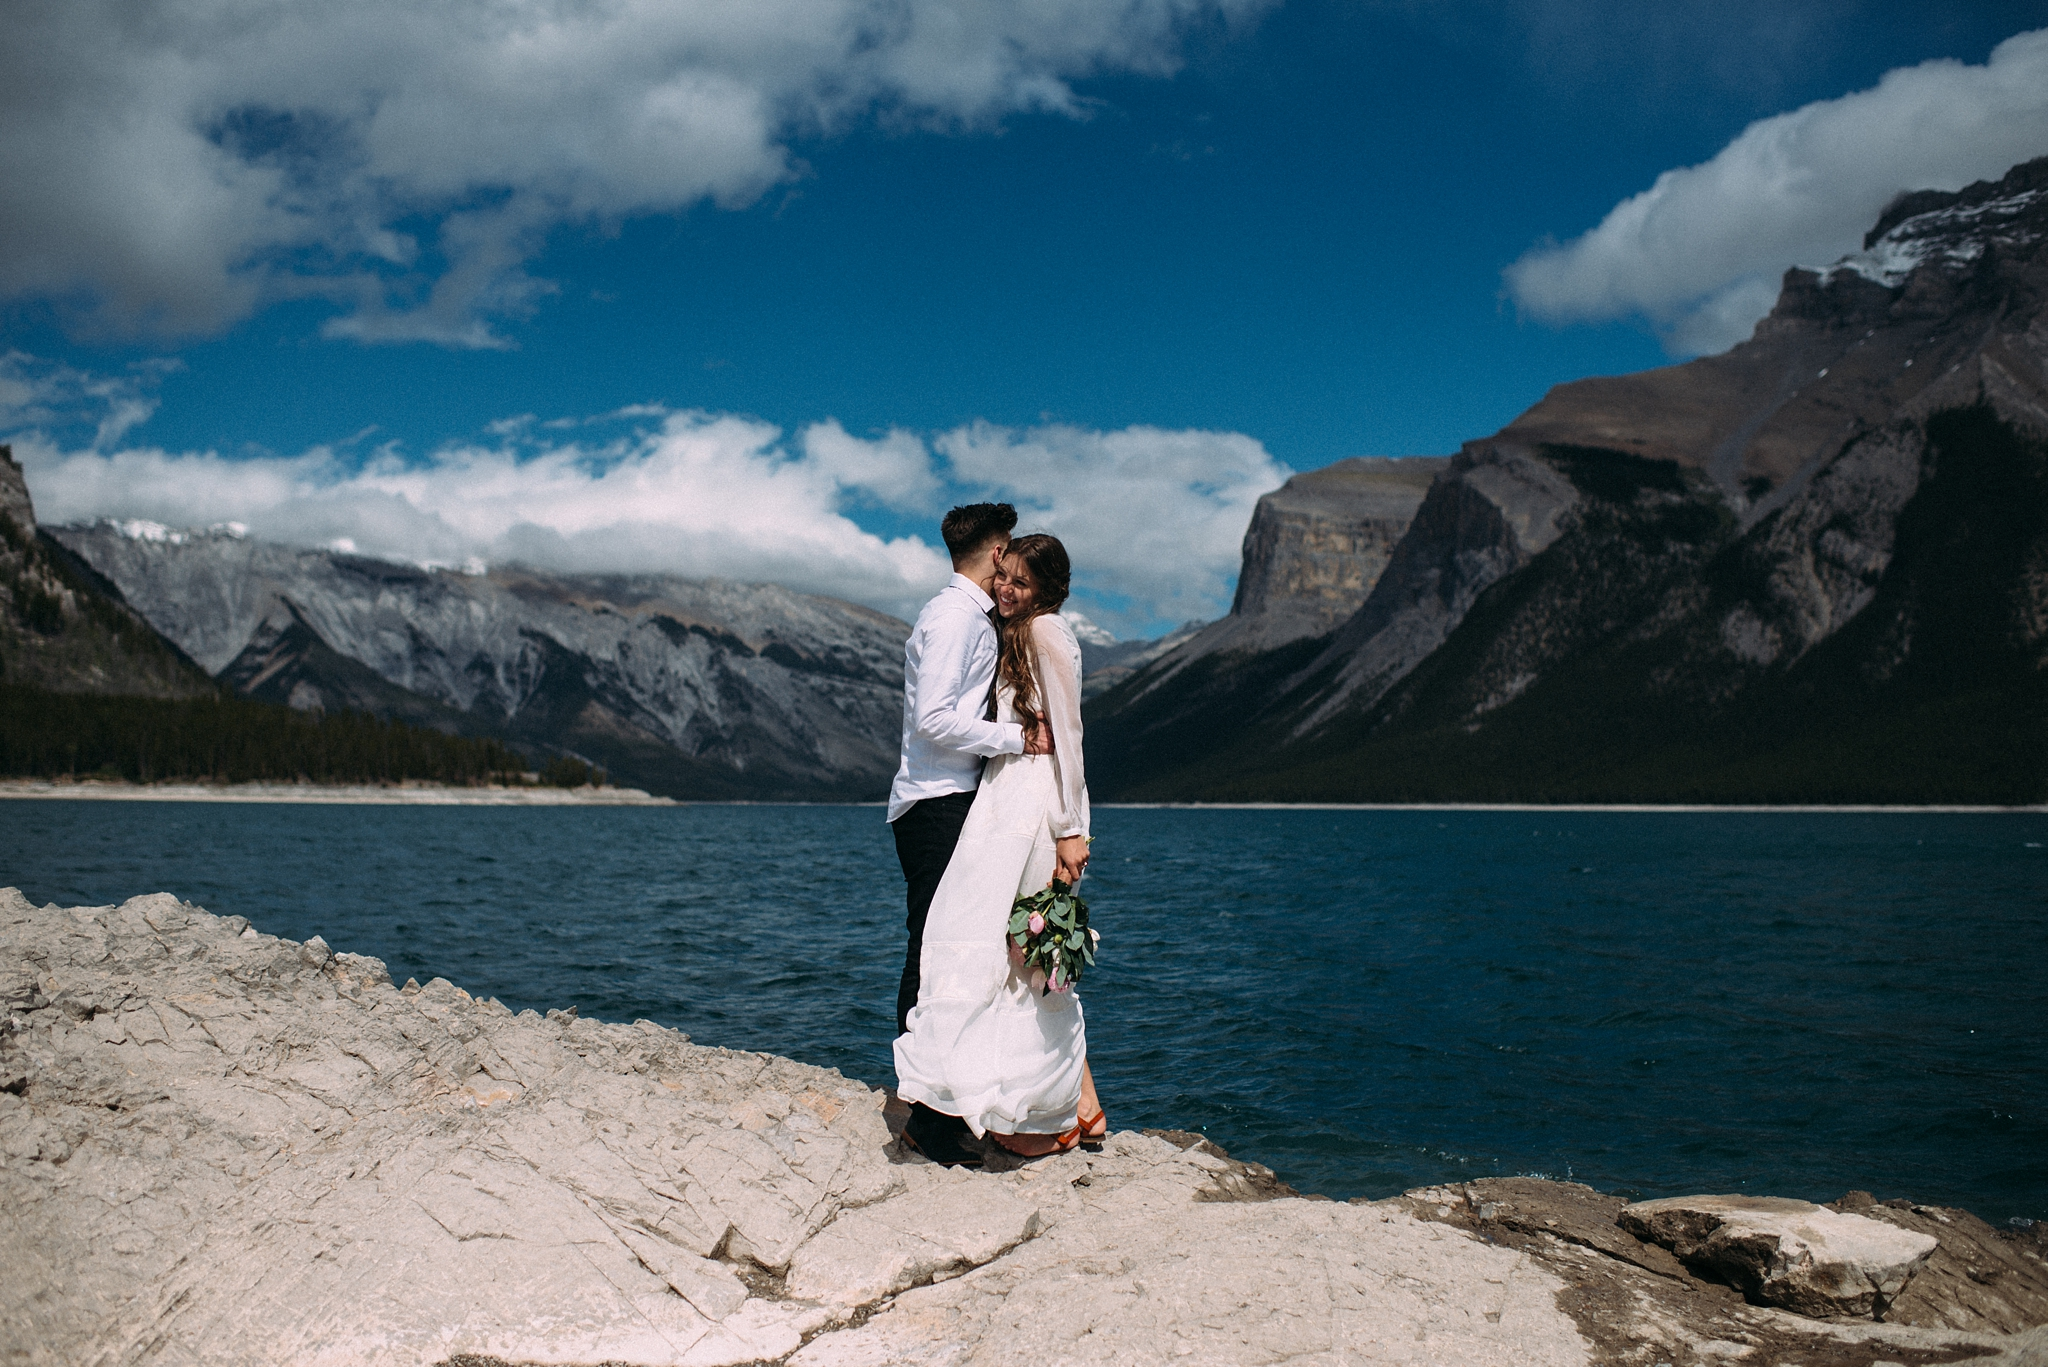 kaihla_tonai_intimate_wedding_elopement_photographer_4100